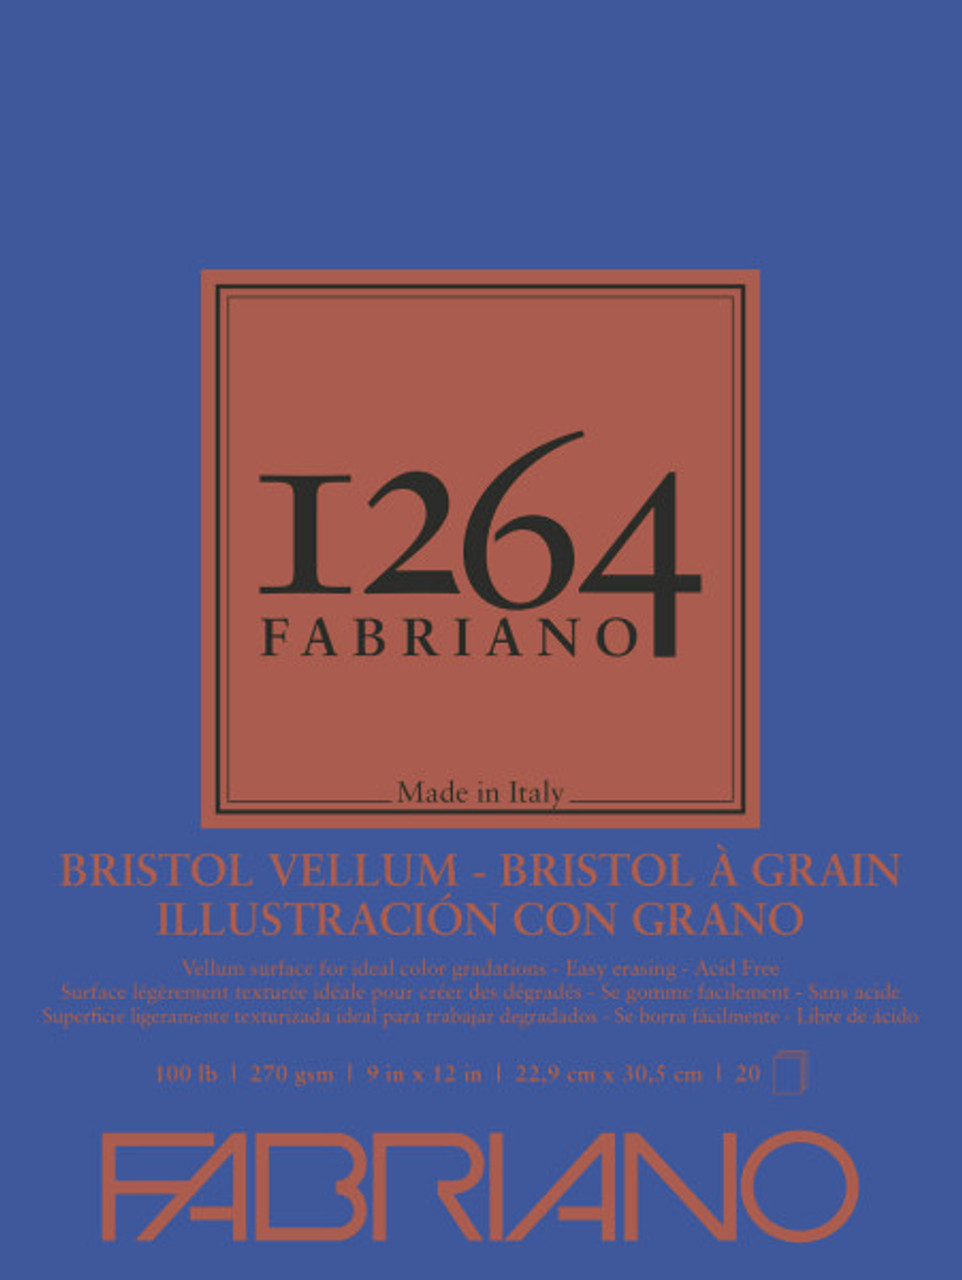 Fabriano 1264 Vellum Bristol Pad